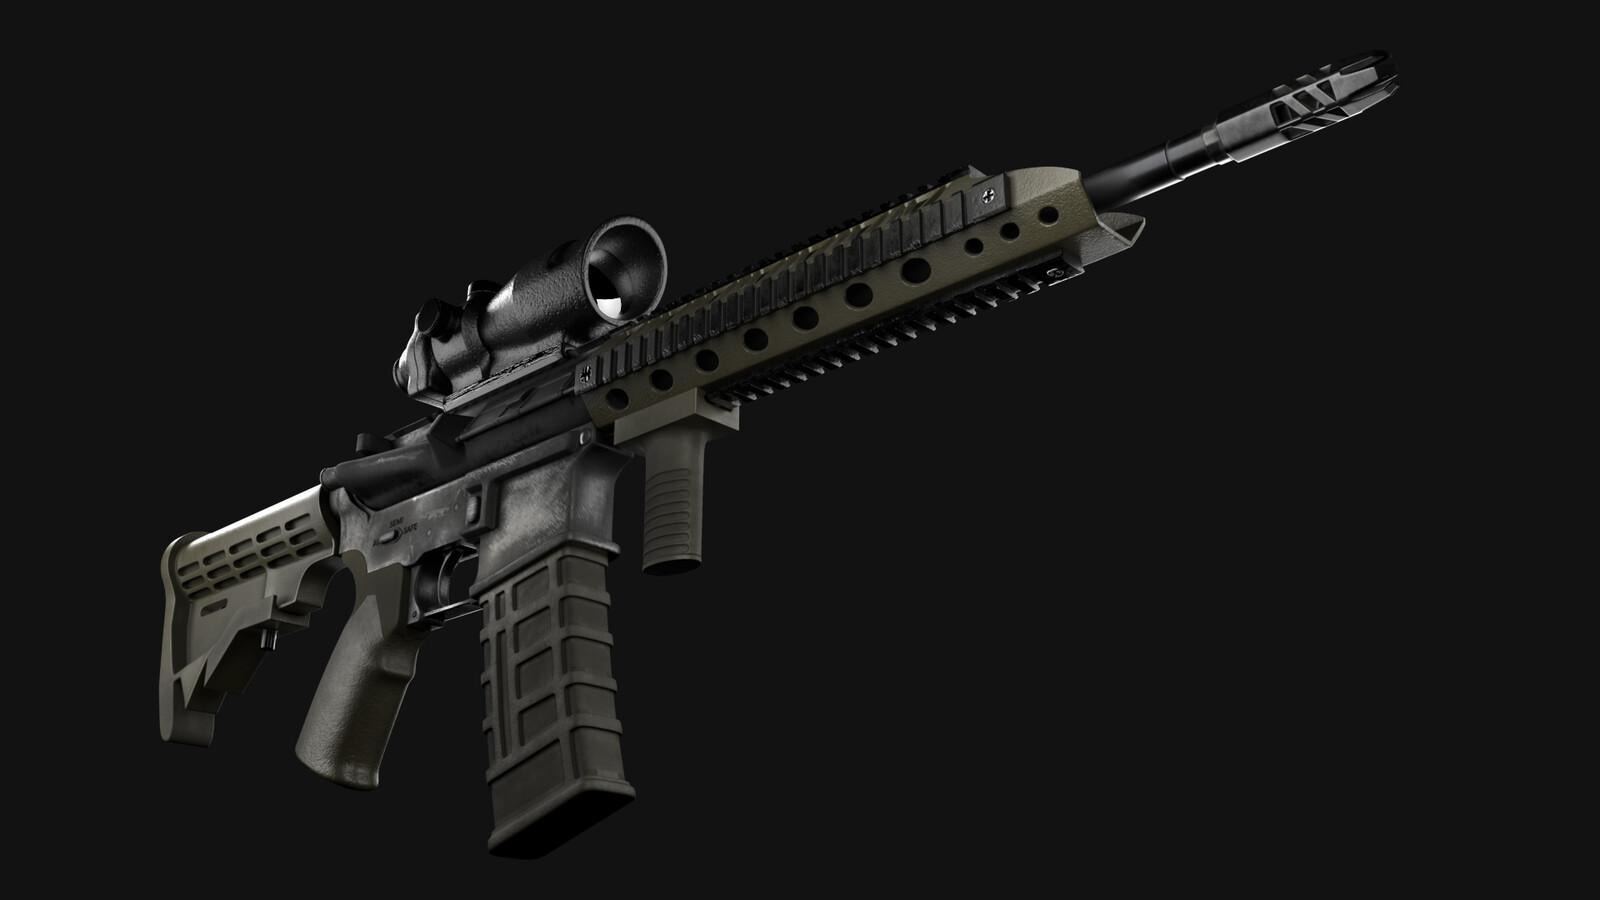 M4A1 Carbine Rifle